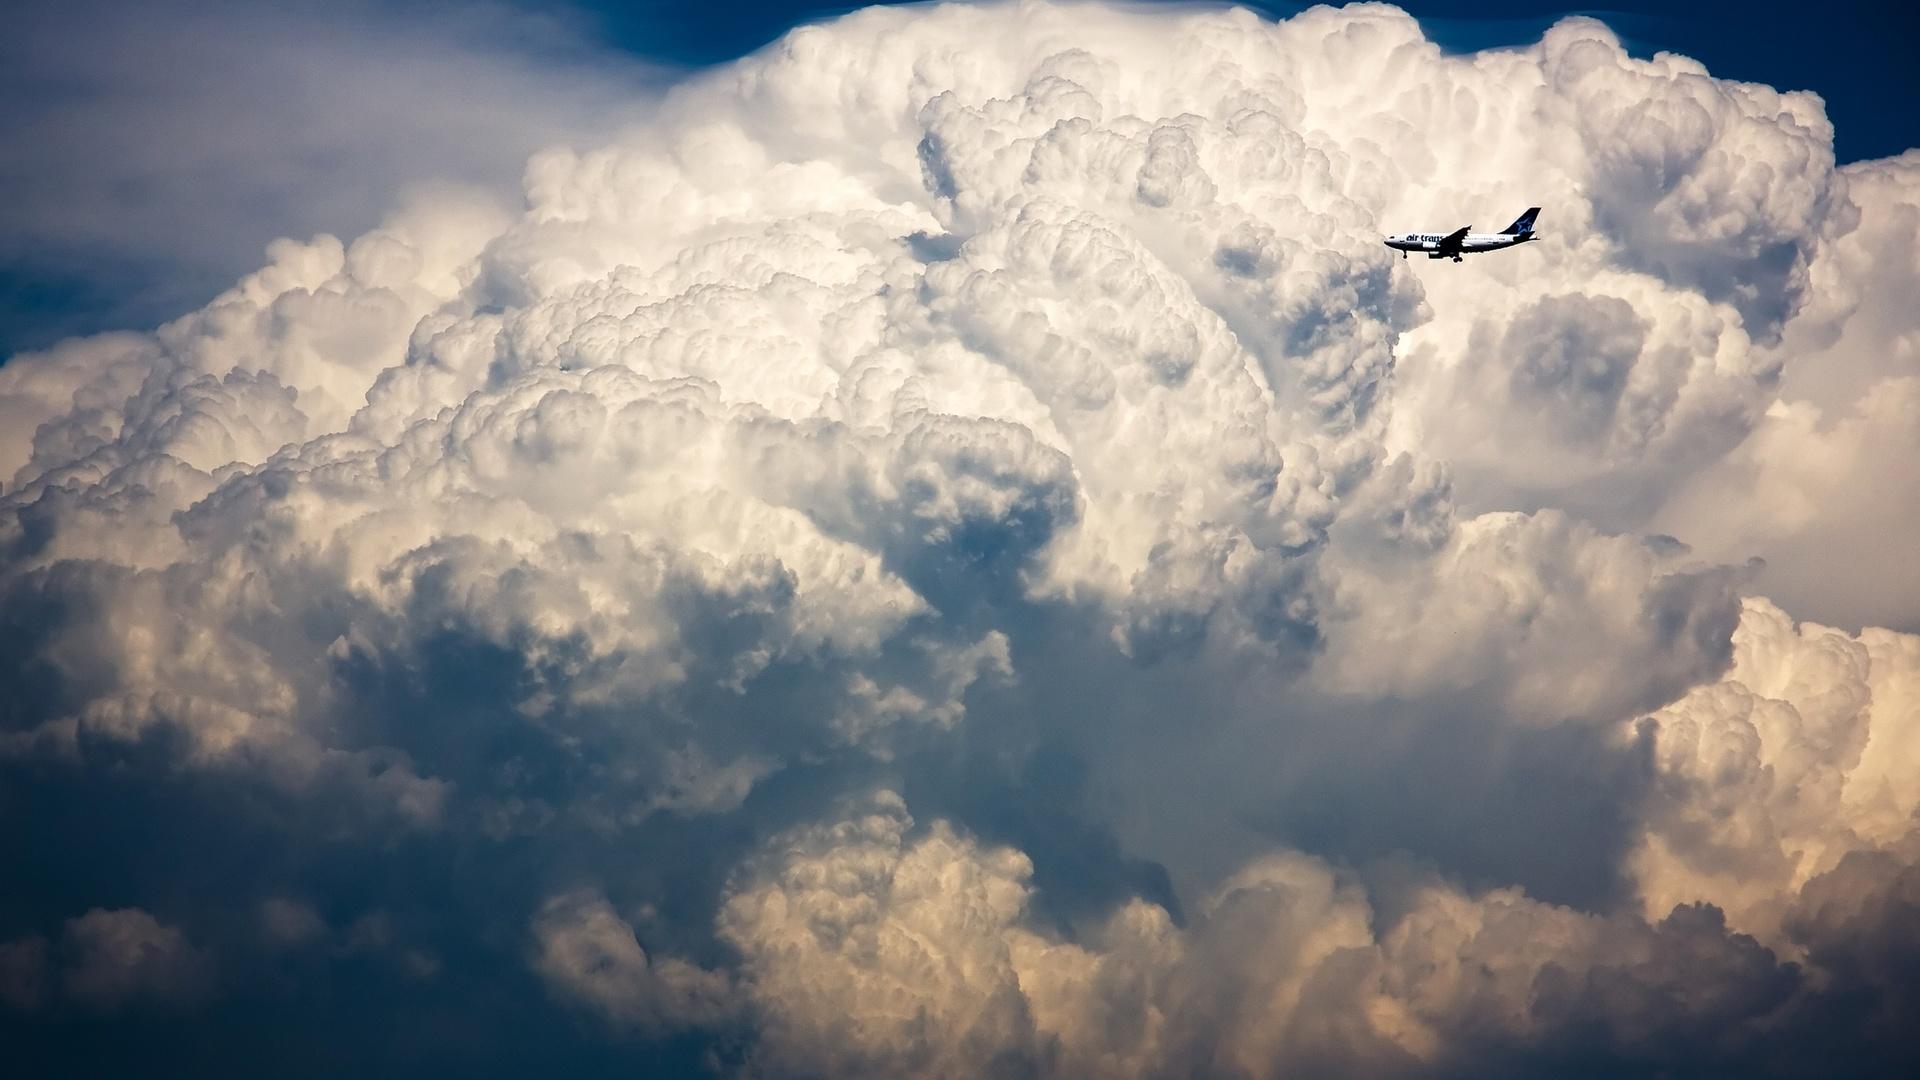 грозовая туча, самолет, небо, шторм